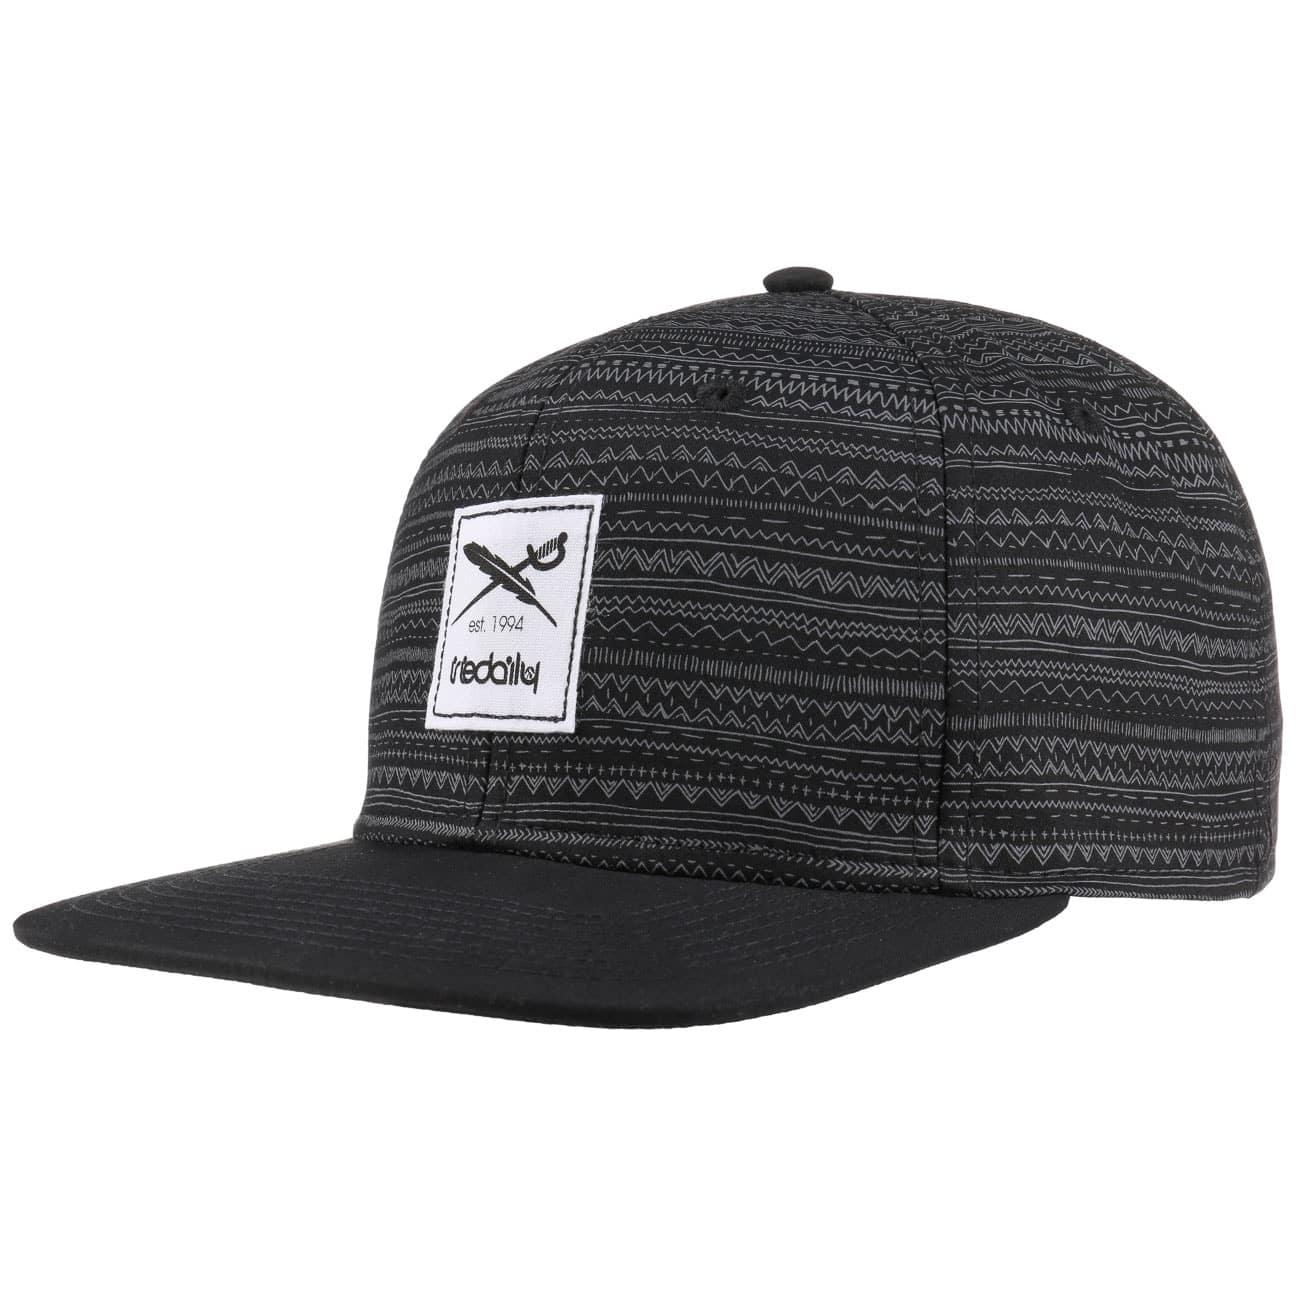 Casquette La Banda Snapback by iriedaily  baseball cap